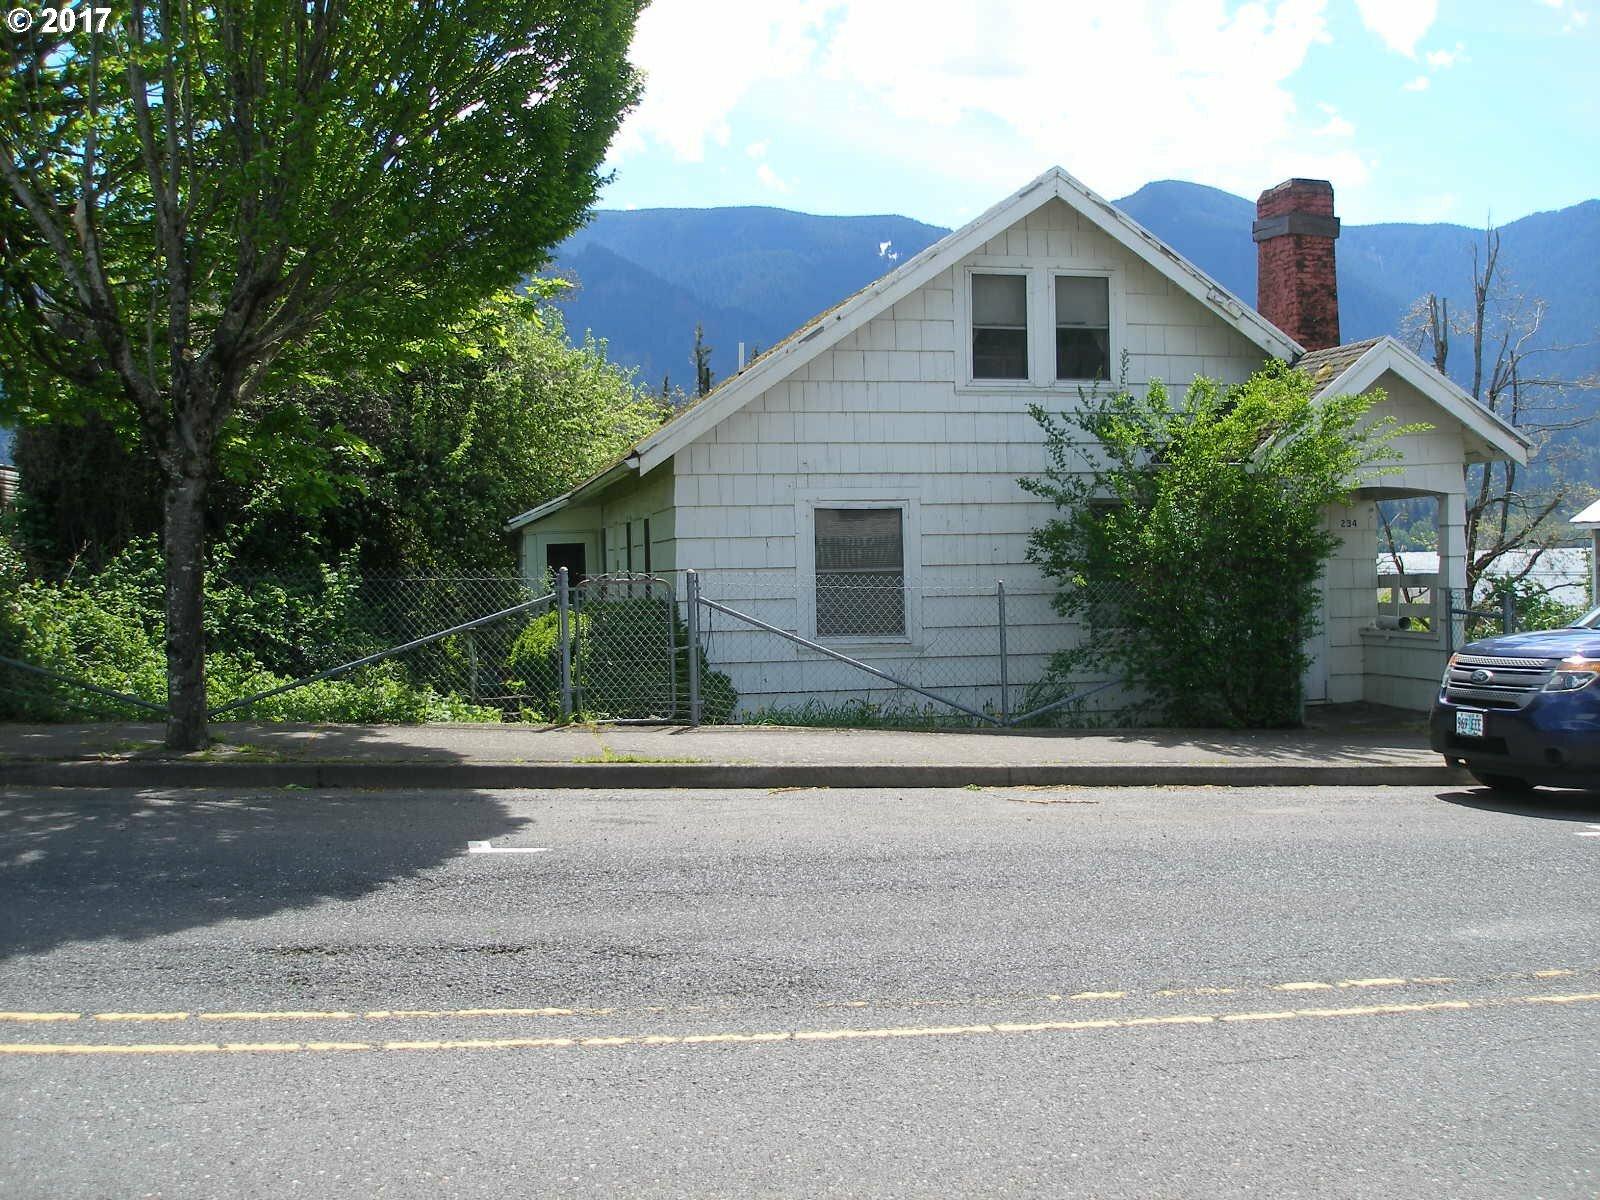 234 Sw First St, Stevenson, WA - USA (photo 1)